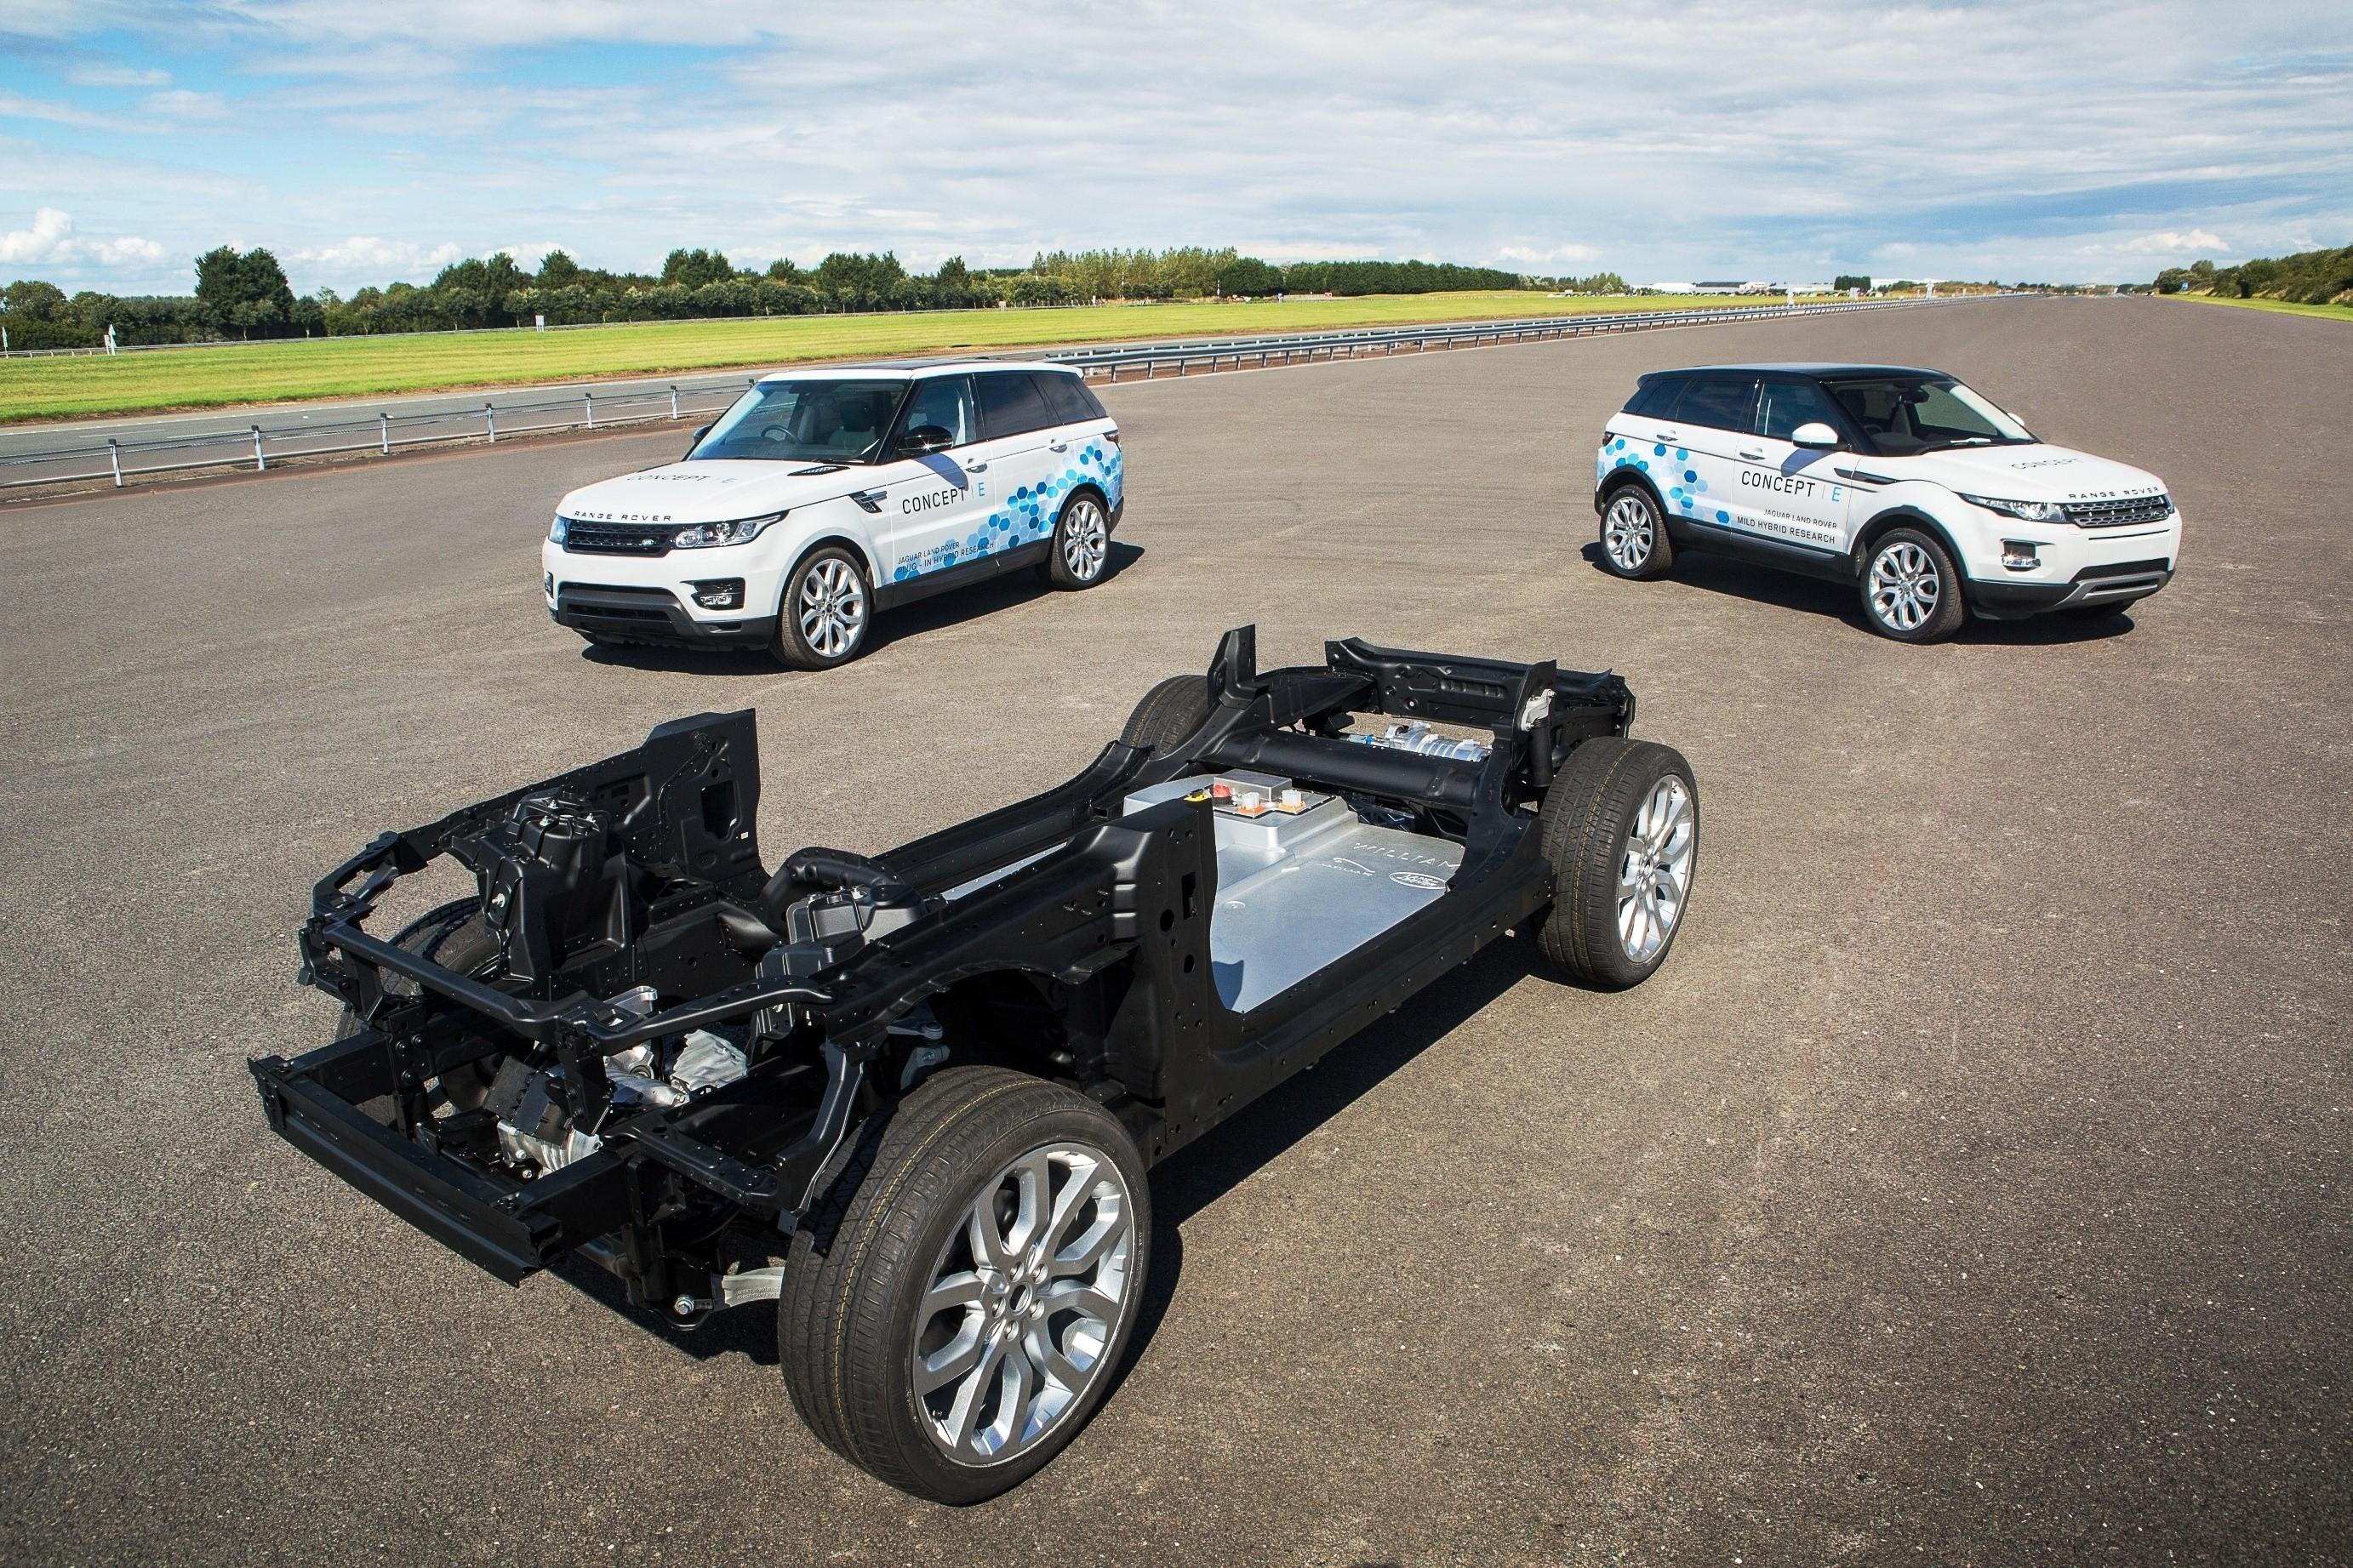 jaguar land rover unveil three low and zero emission platforms at cenex autoevolution. Black Bedroom Furniture Sets. Home Design Ideas